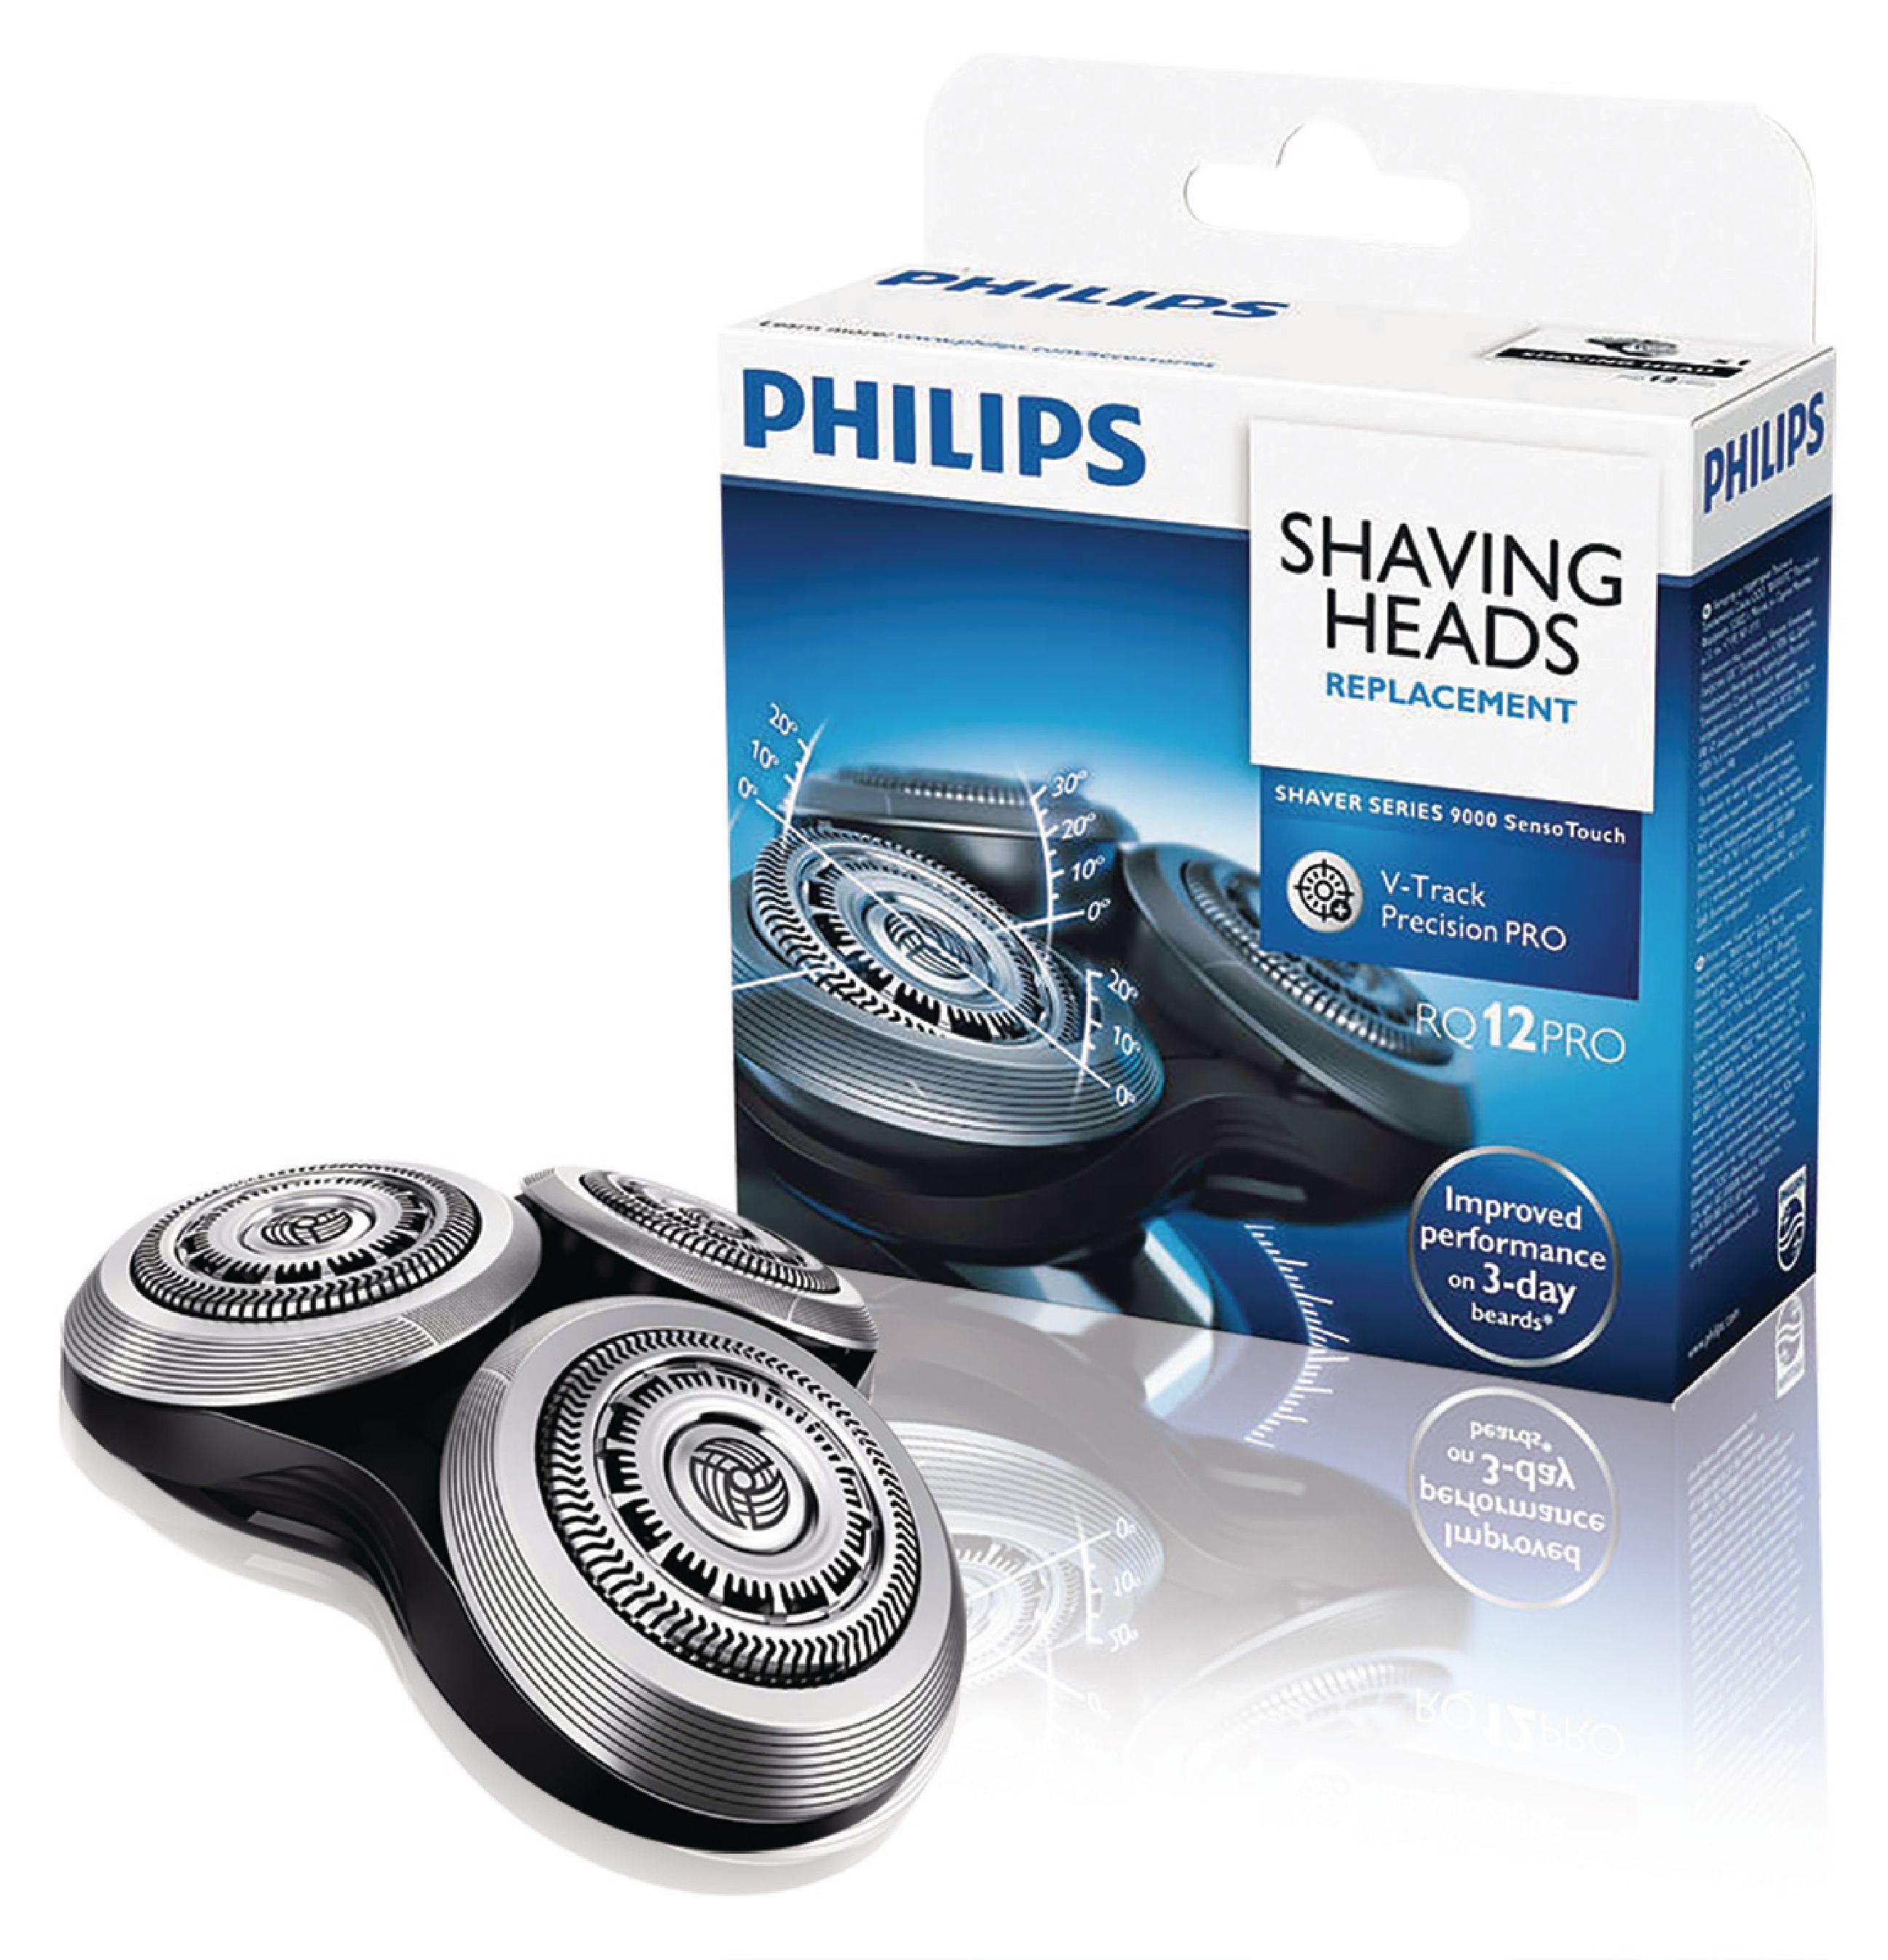 Holicí frézky Philips RQ10/RQ12